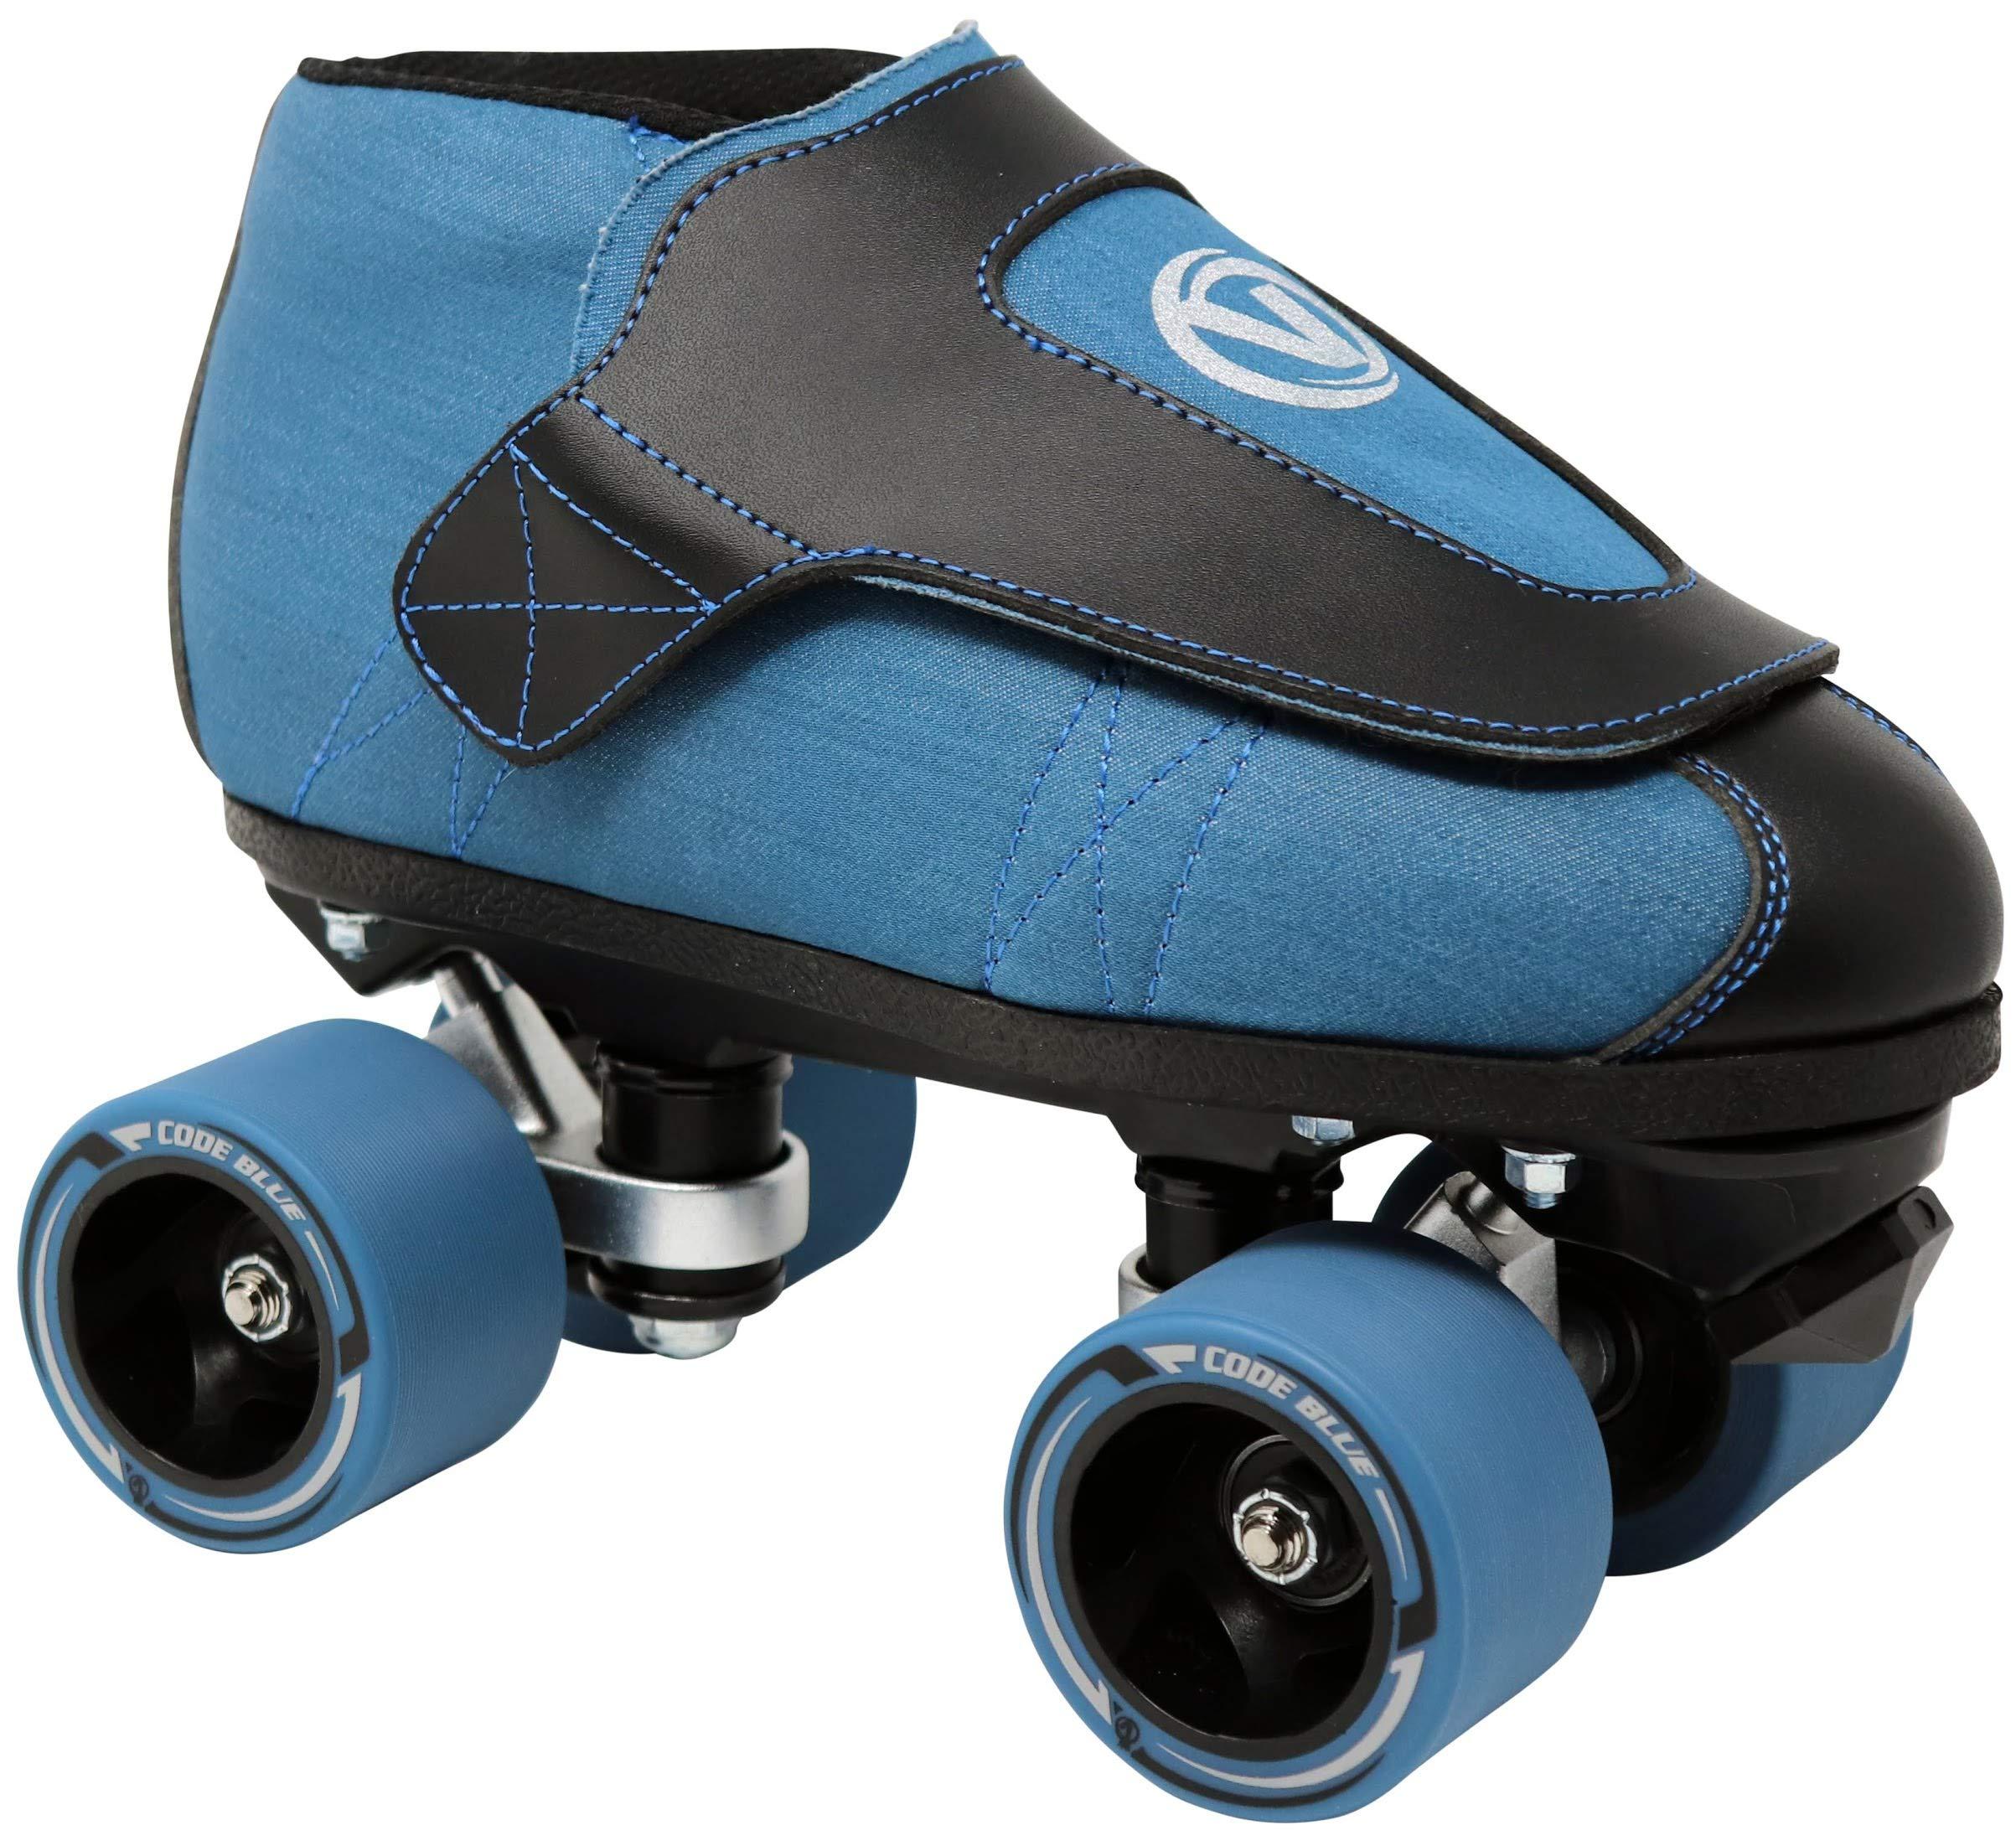 VNLA Code Blue Jam Skate - Mens & Womens Speed Skates - Quad Skates for Women & Men - Adjustable Roller Skate/Rollerskates - Outdoor & Indoor Adult Quad Skate - Kid/Kids Roller Skates (Size 8) by VNLA (Image #1)